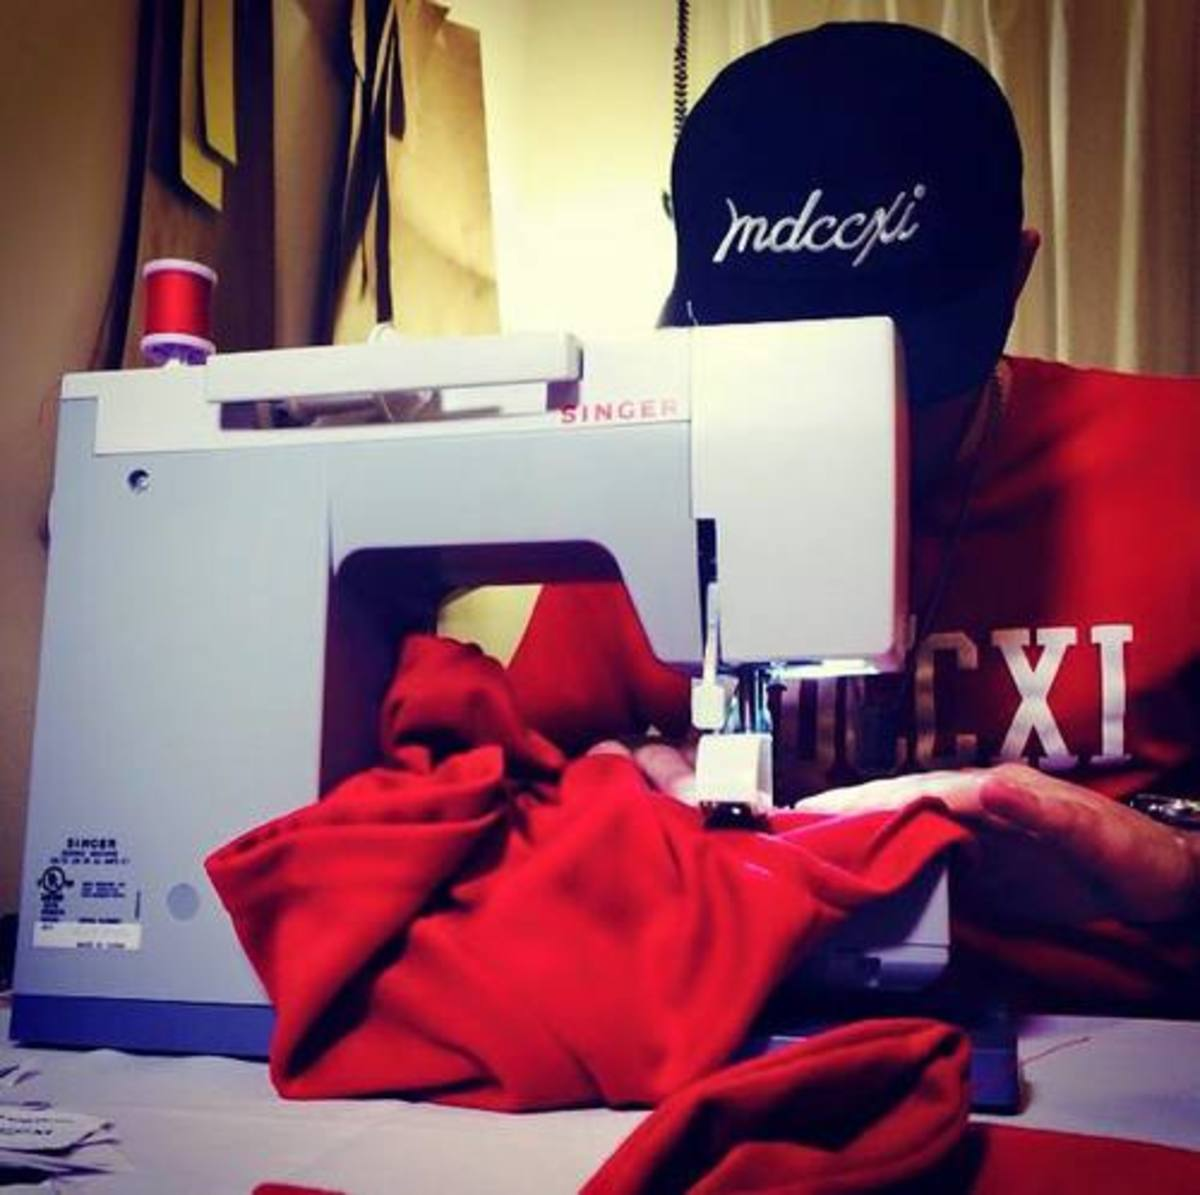 mdccxi-apparel-streetwear-colabination